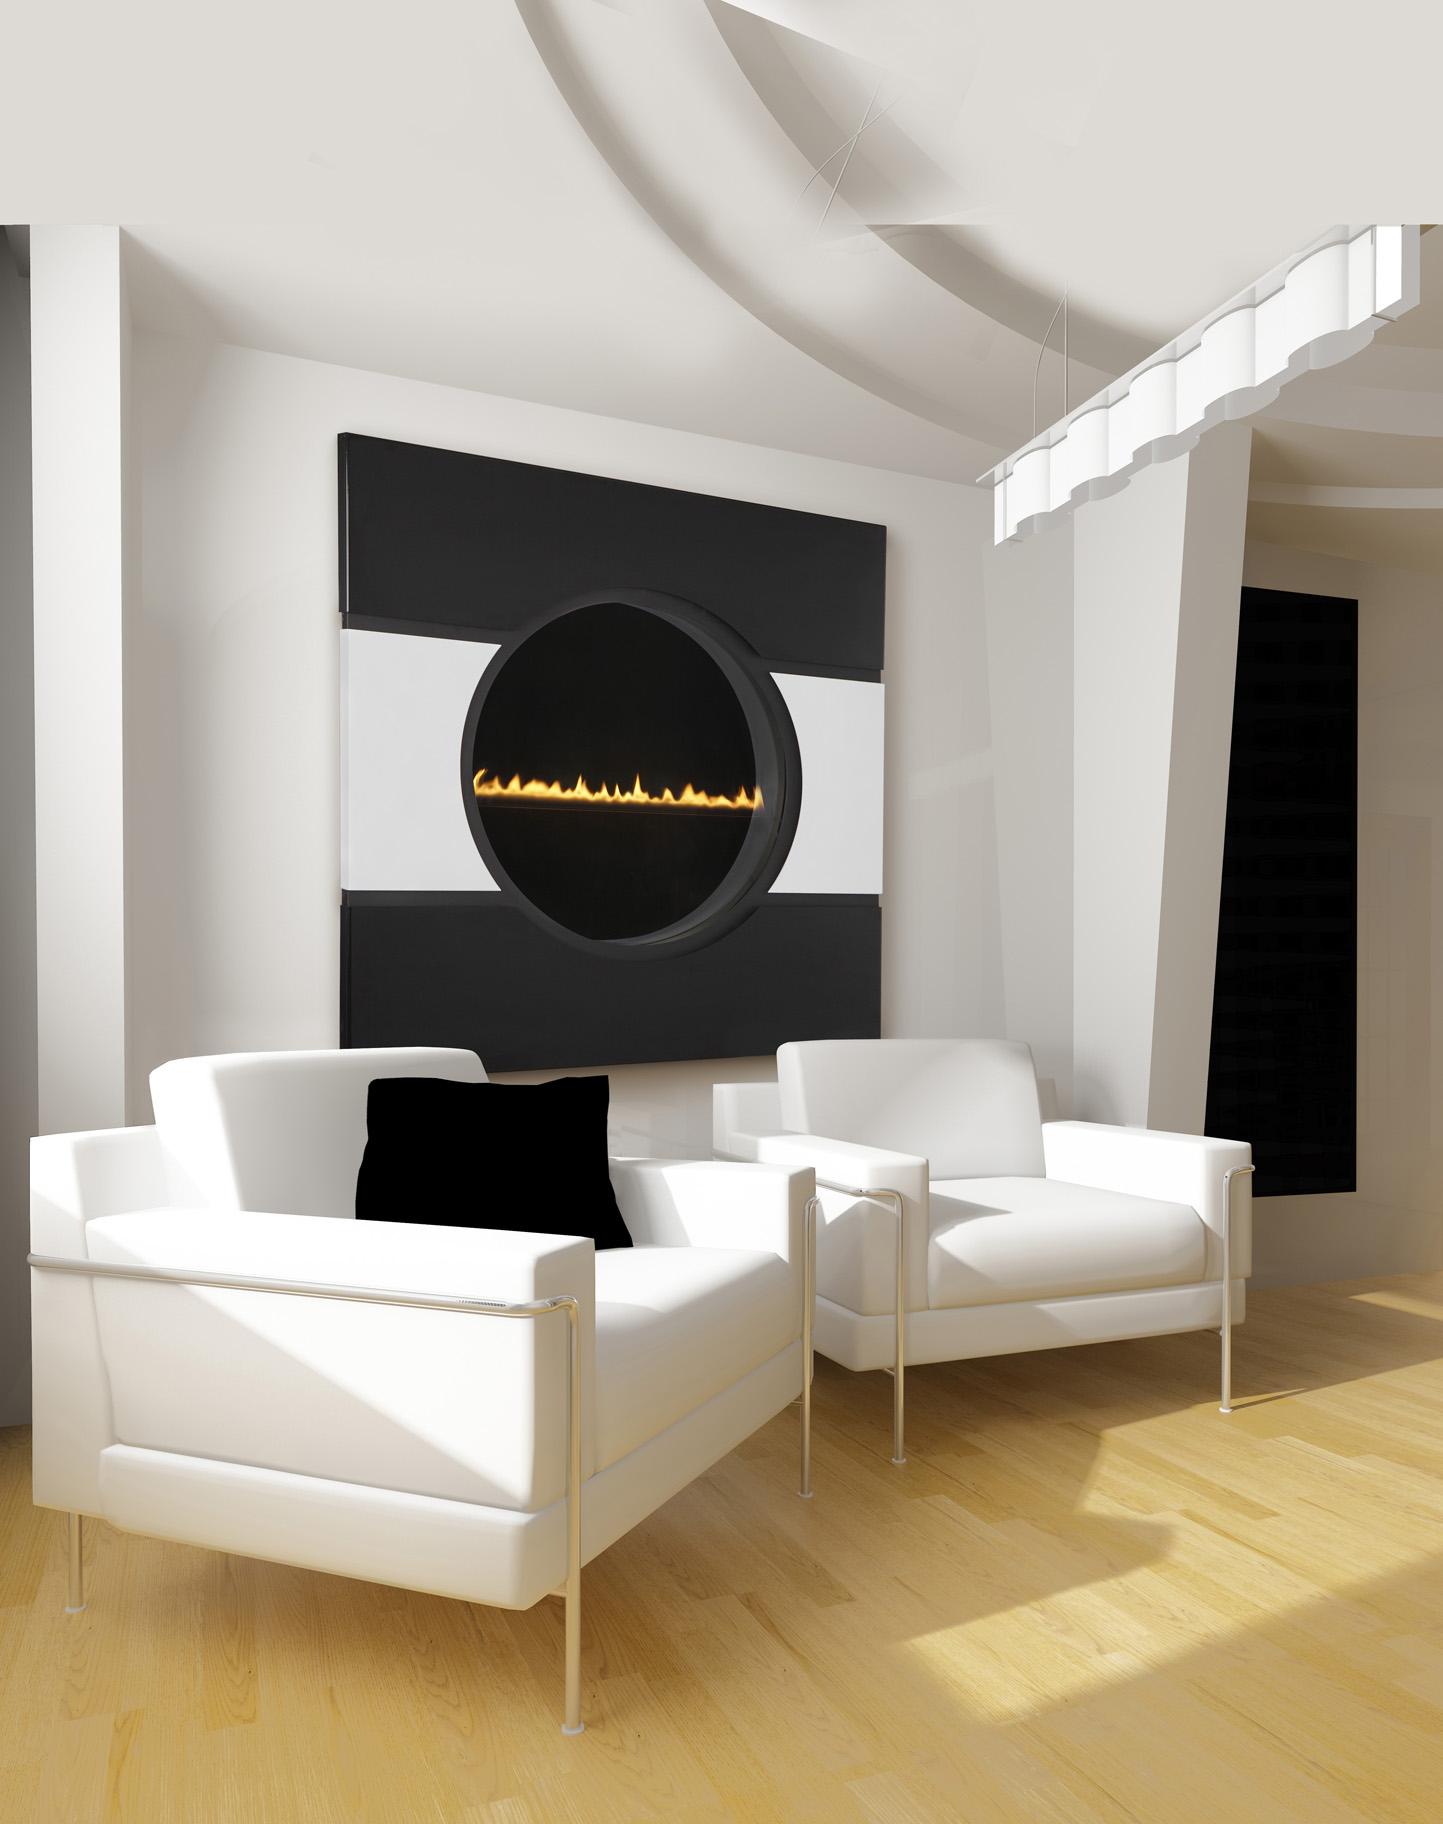 Solaris ST w/ Decorative Panels